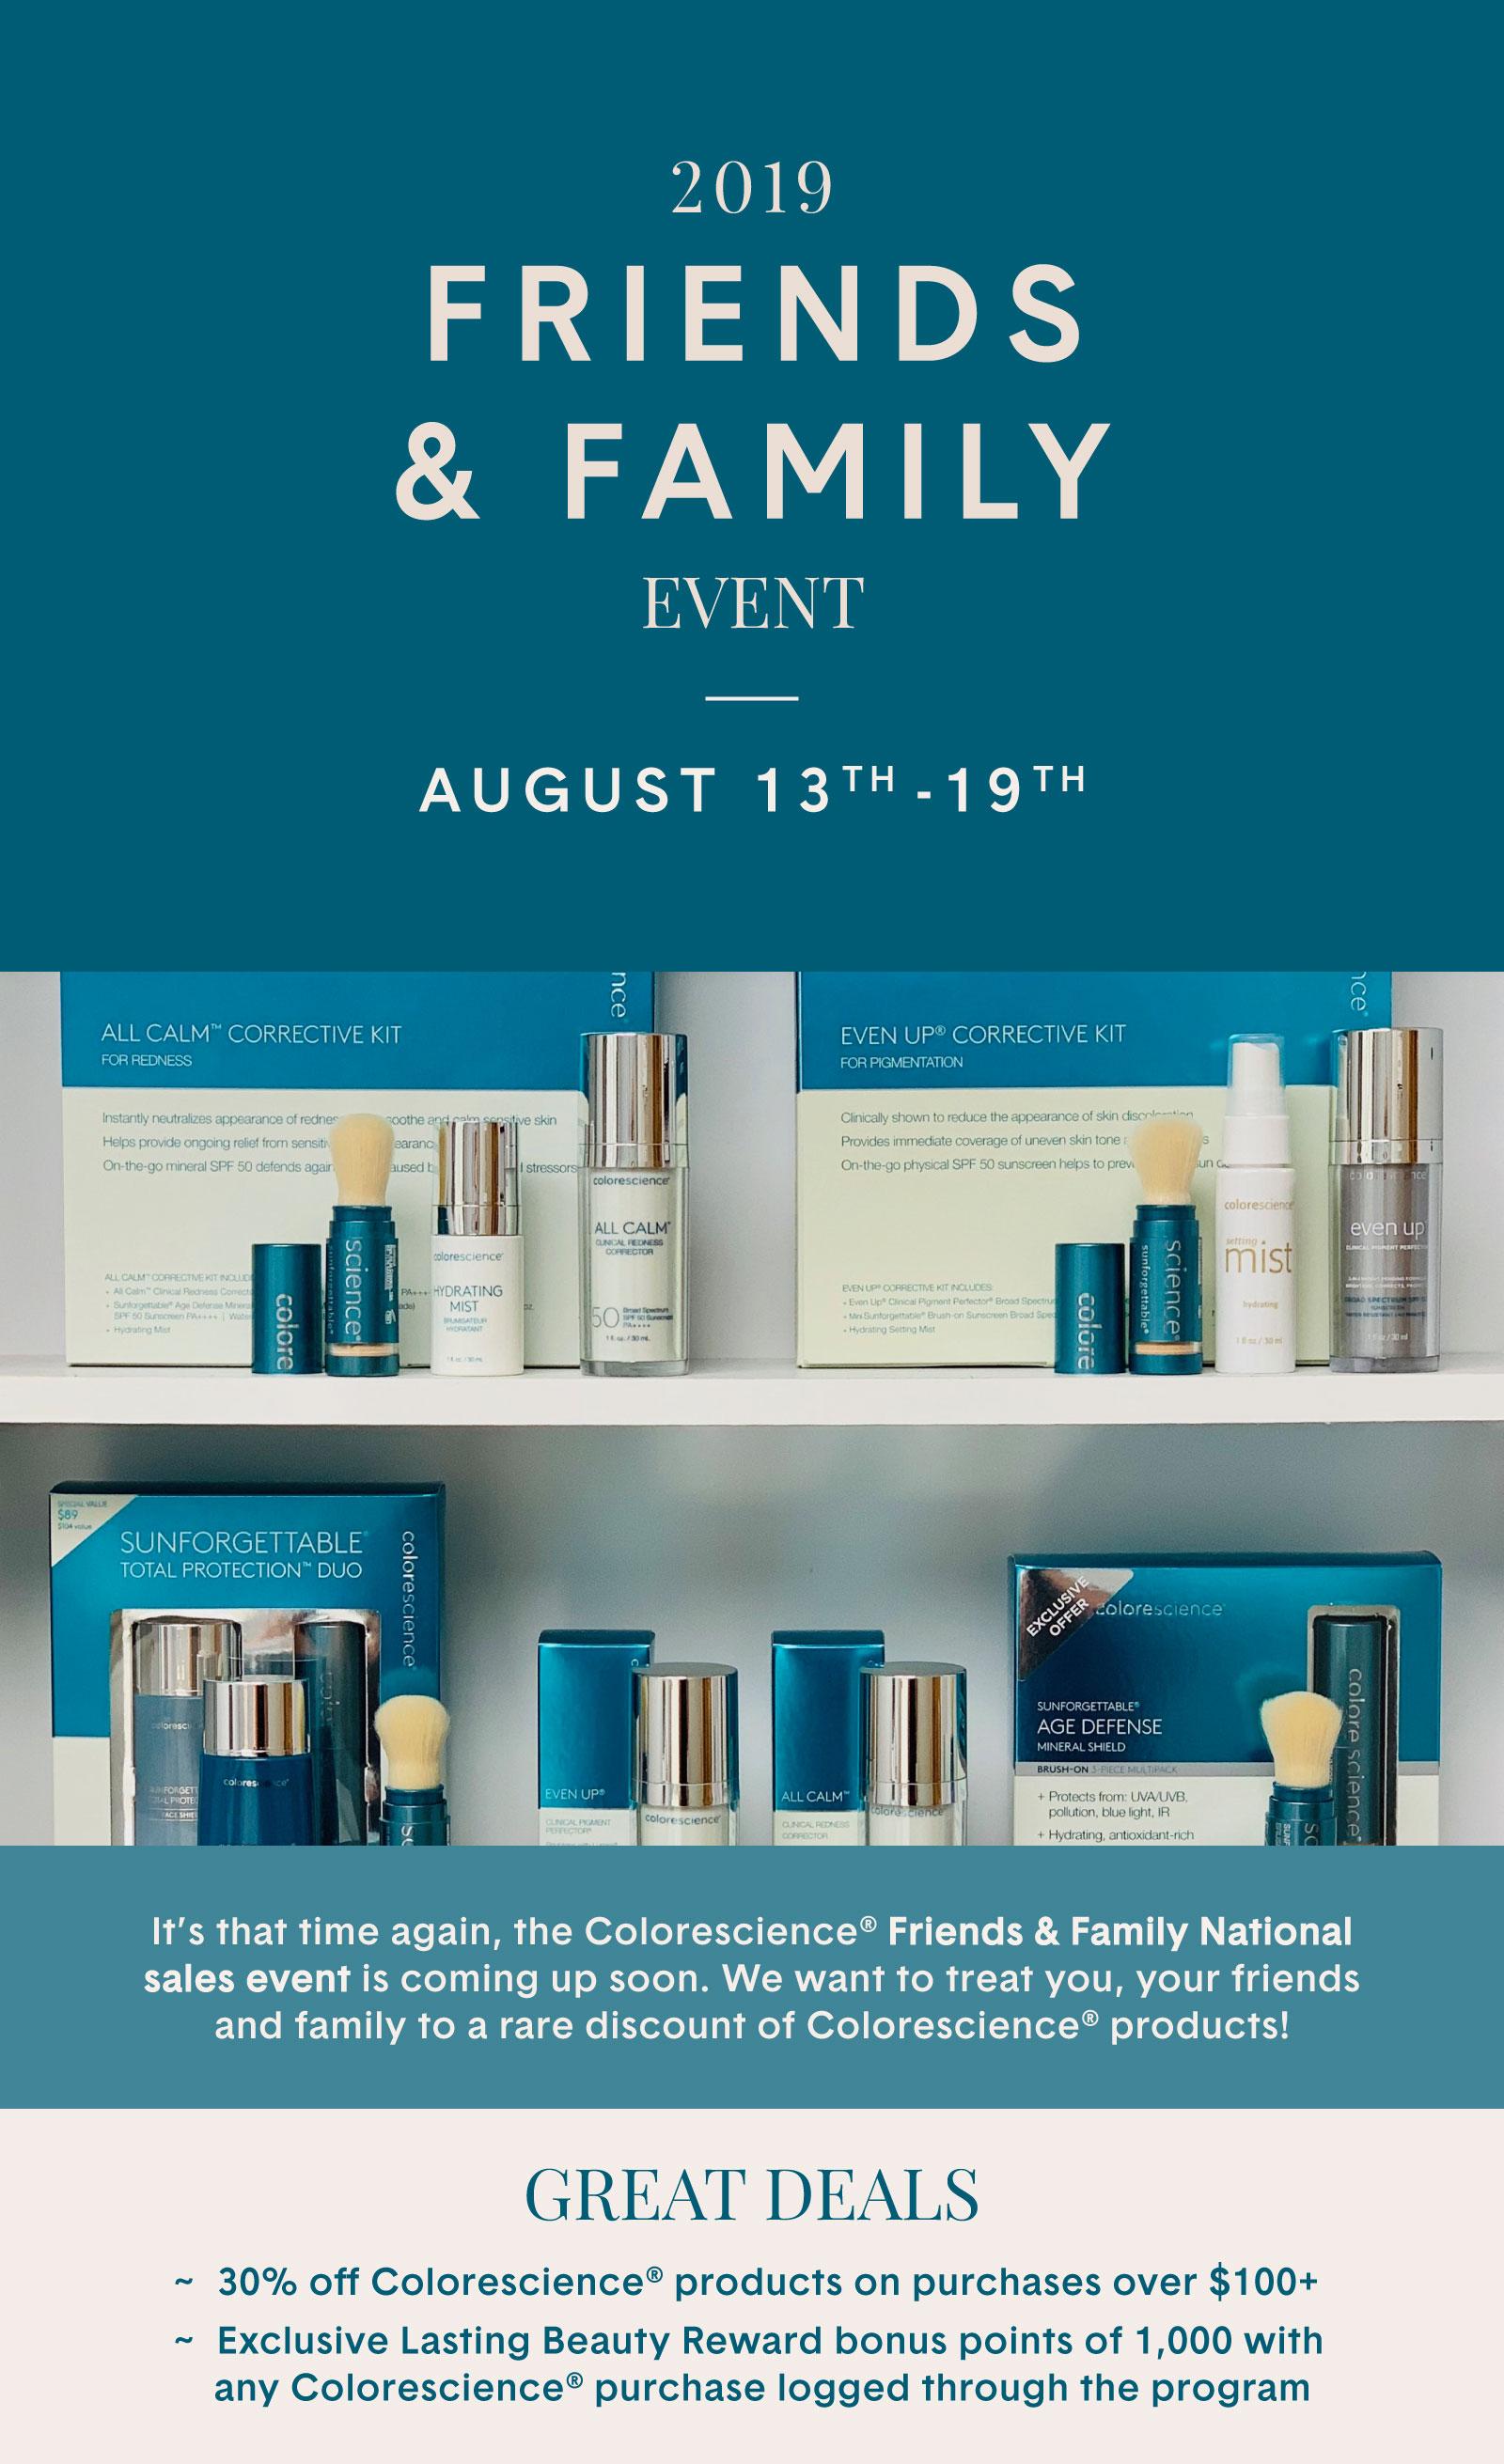 colorescience, aesthetics, colorescience products, tampa dermatology, tampa dermatologist, dermatologist in tampa